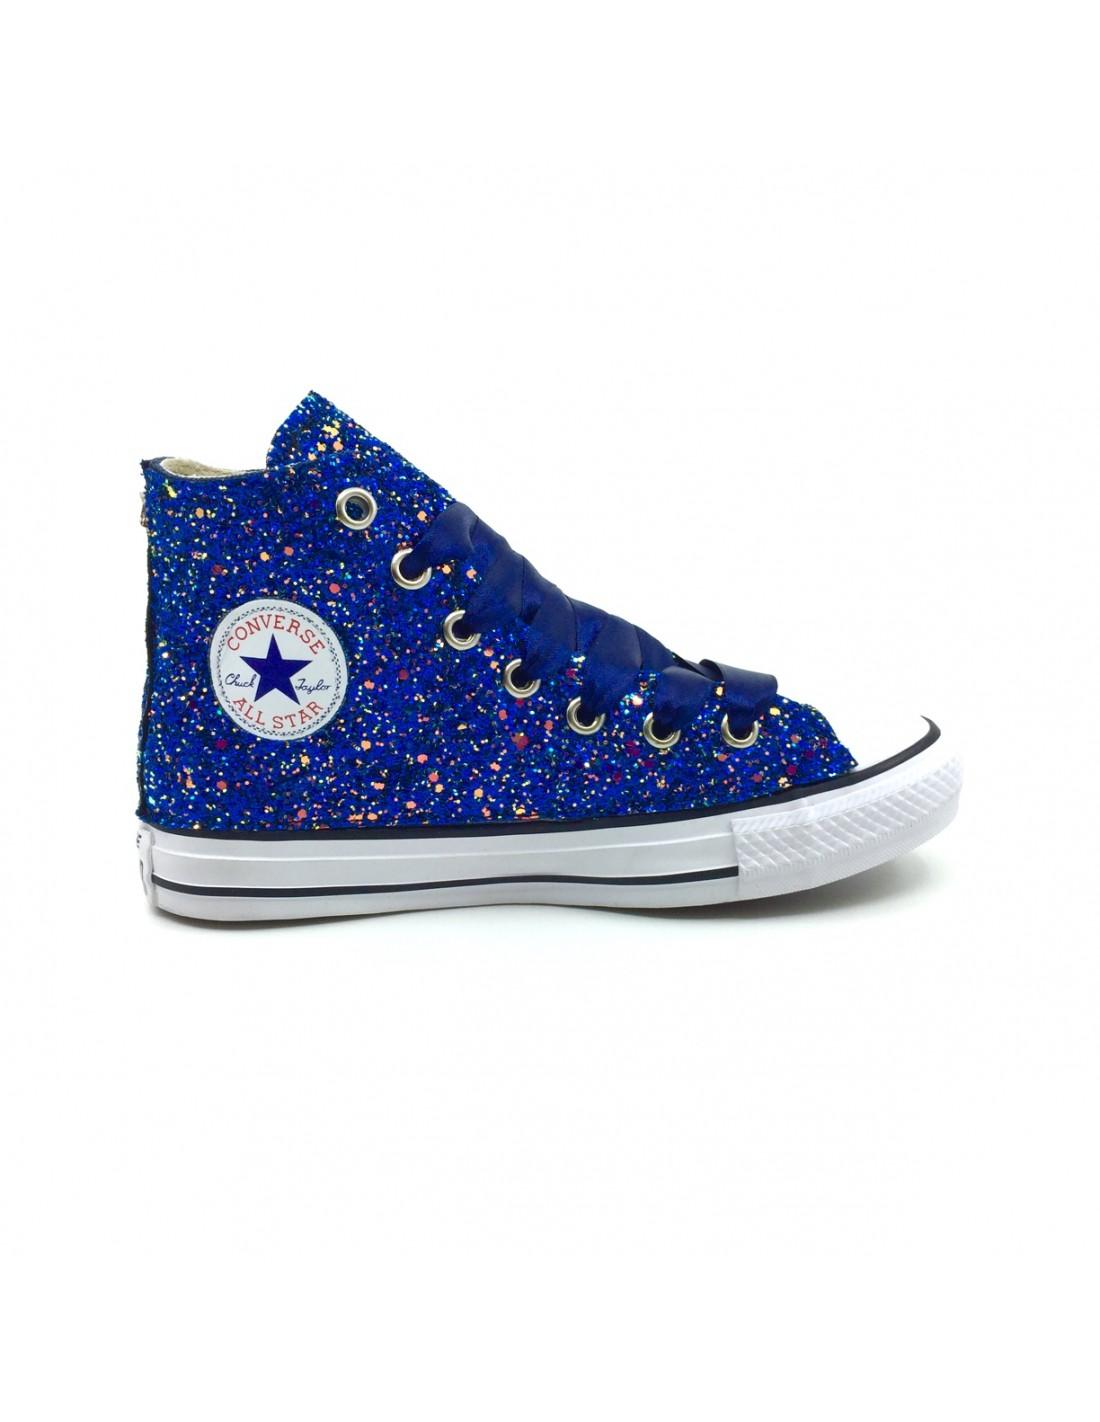 Converse AllStar Blu full Glitter